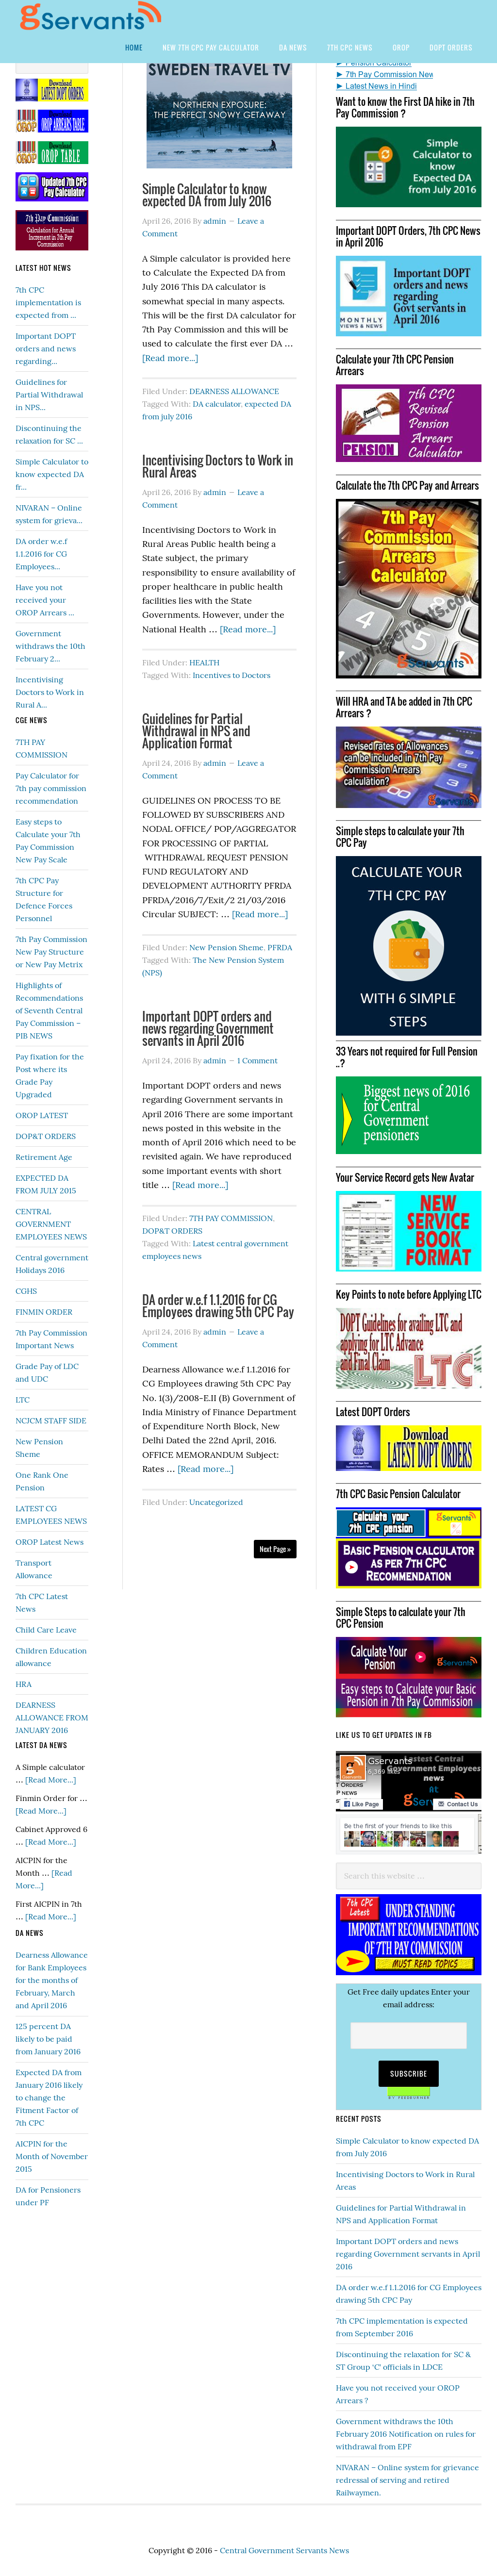 Owler Reports - Gservants Blog Pension Arrears Calculator as Per New